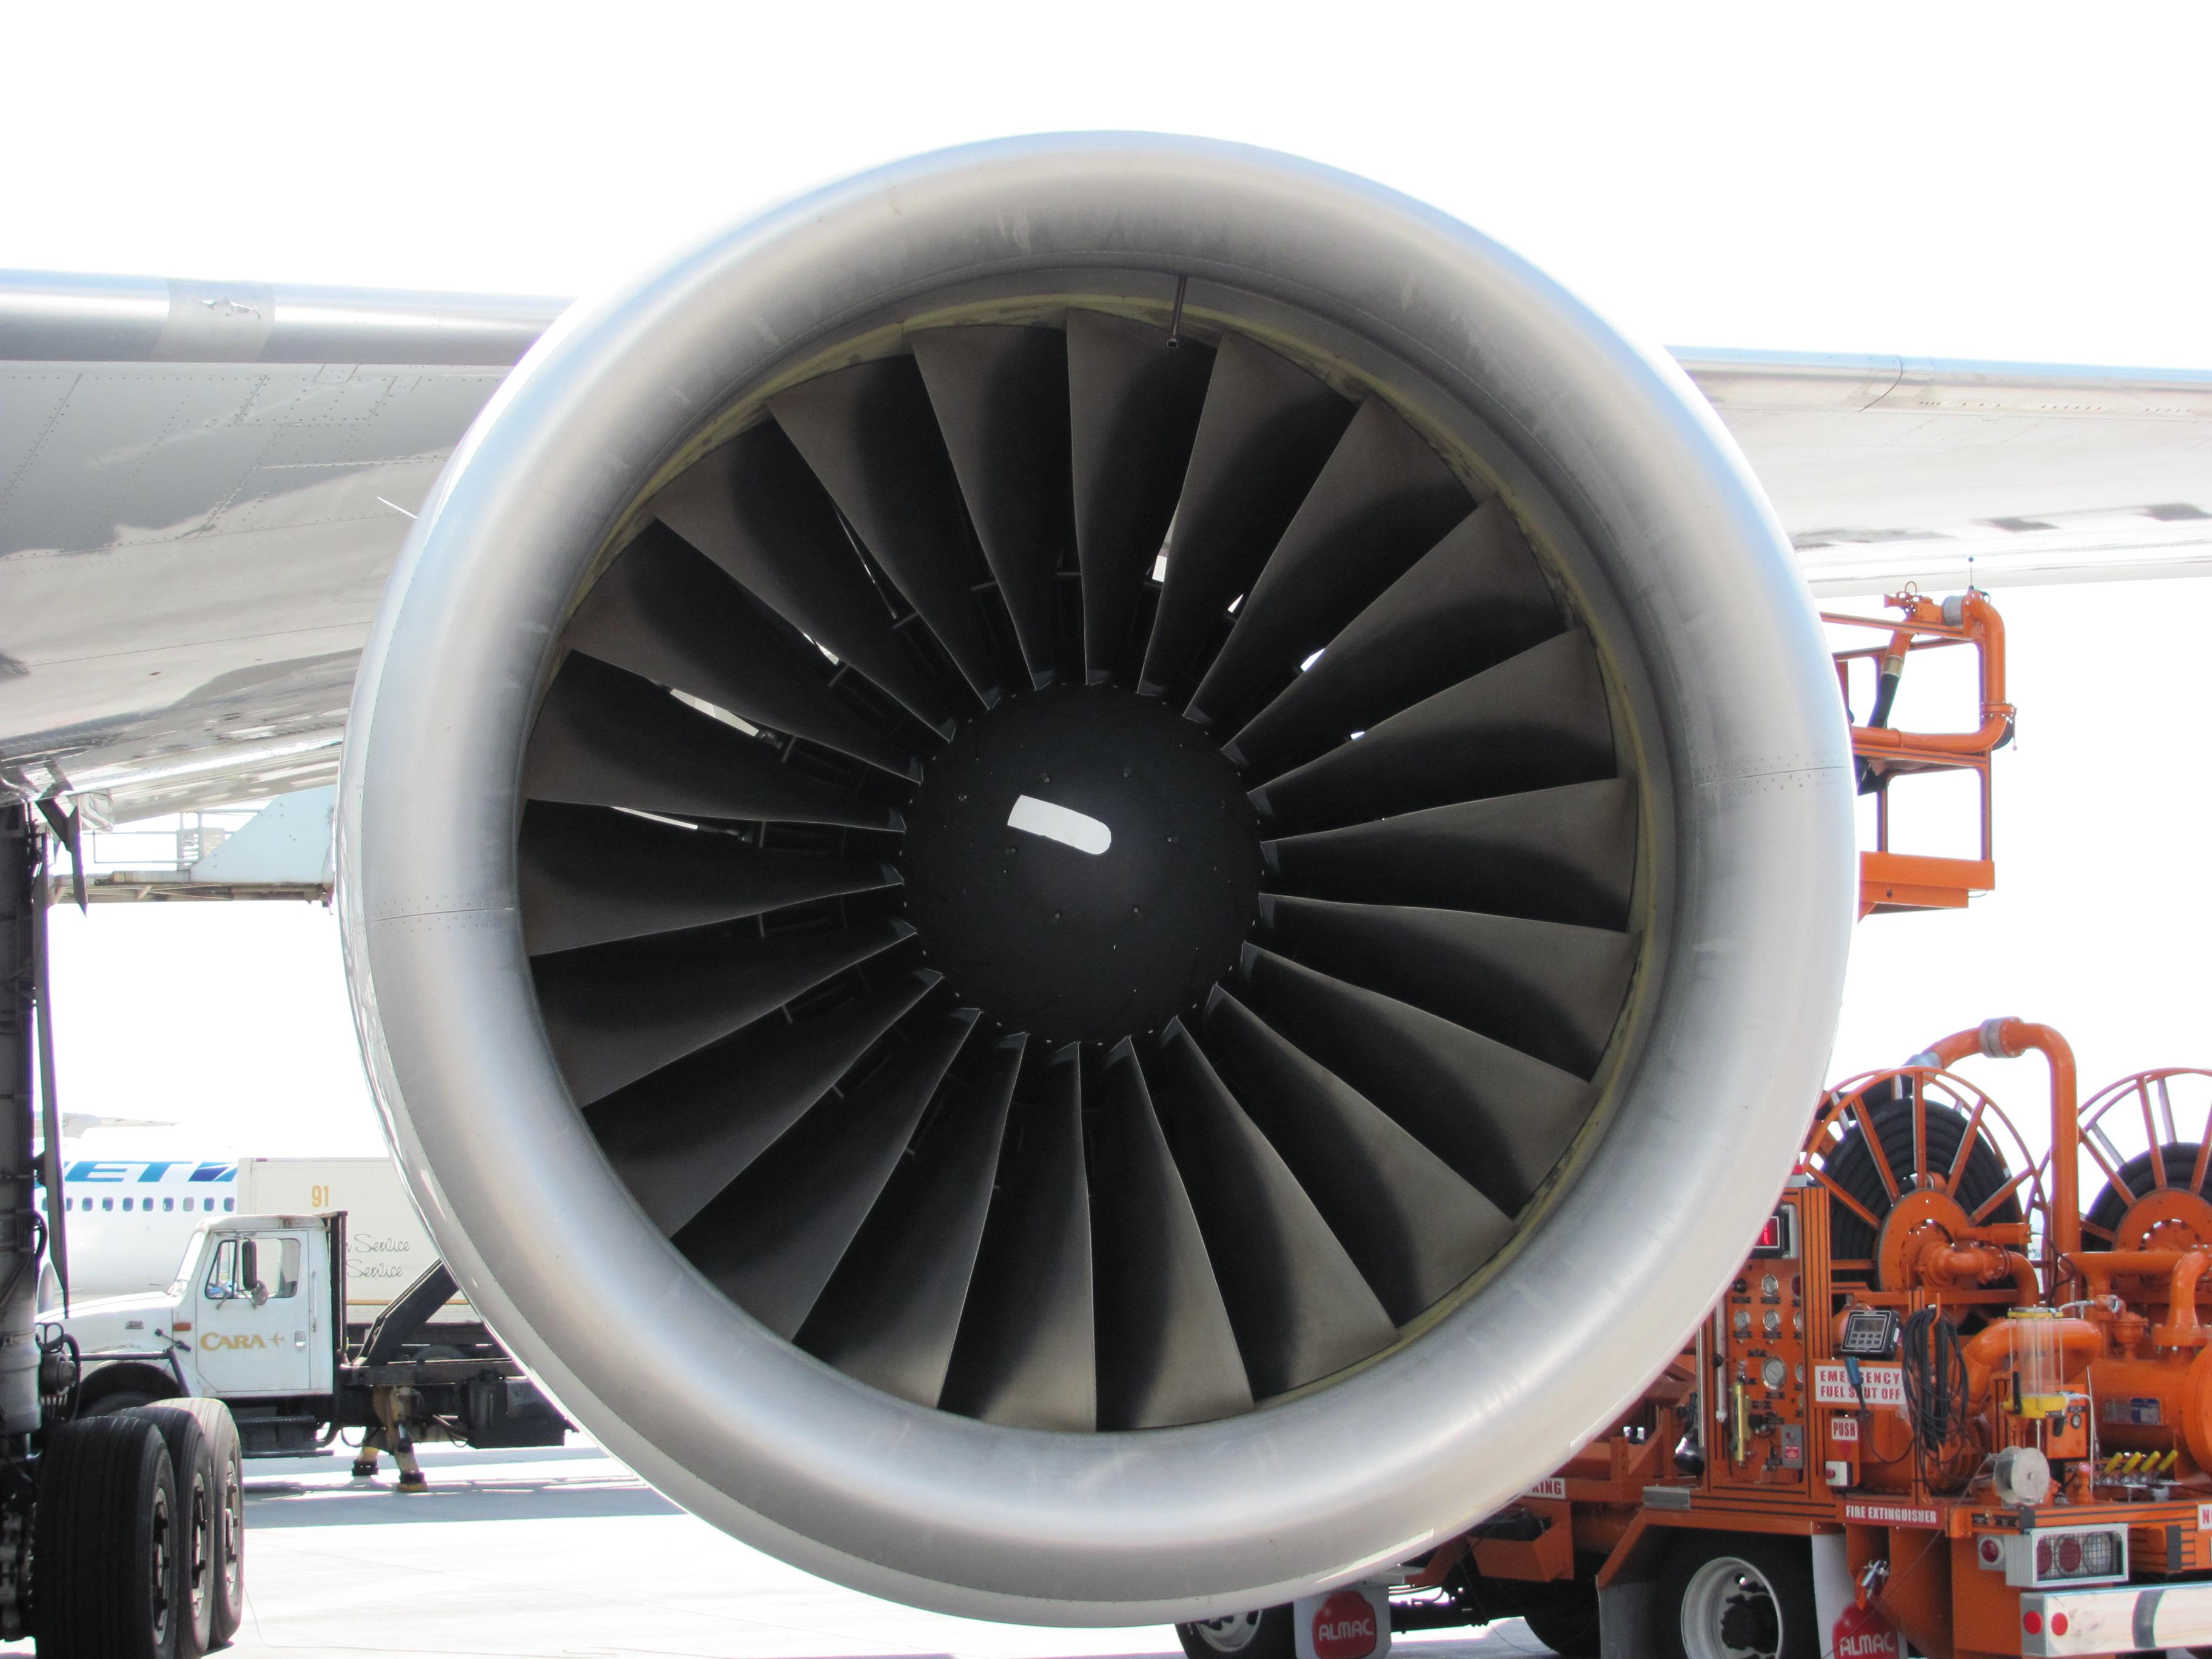 File:Pratt & Whitney PW4000 (4836578201).jpg